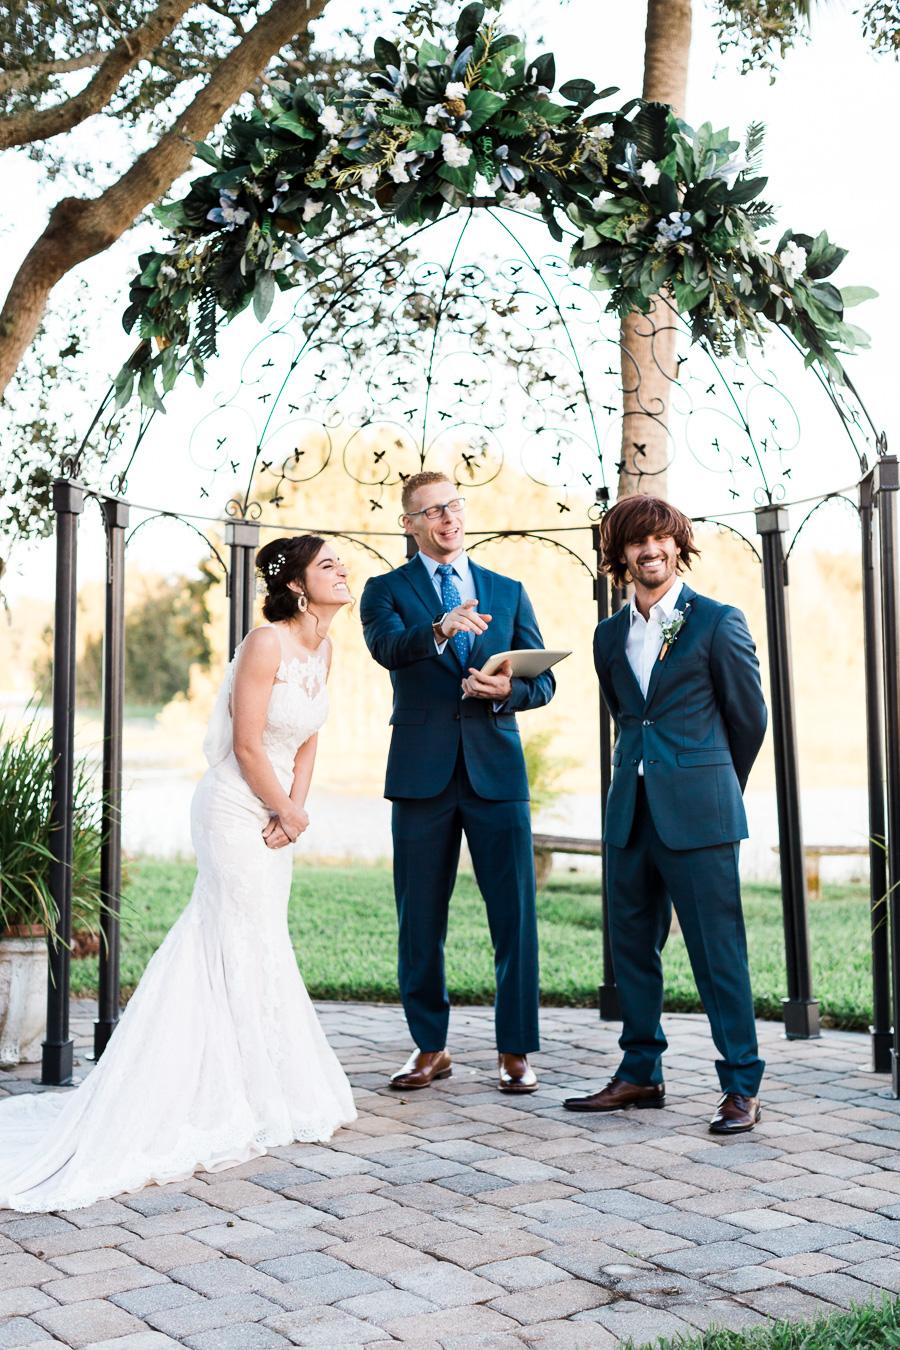 Wedding-photographer-orlando-74.jpg